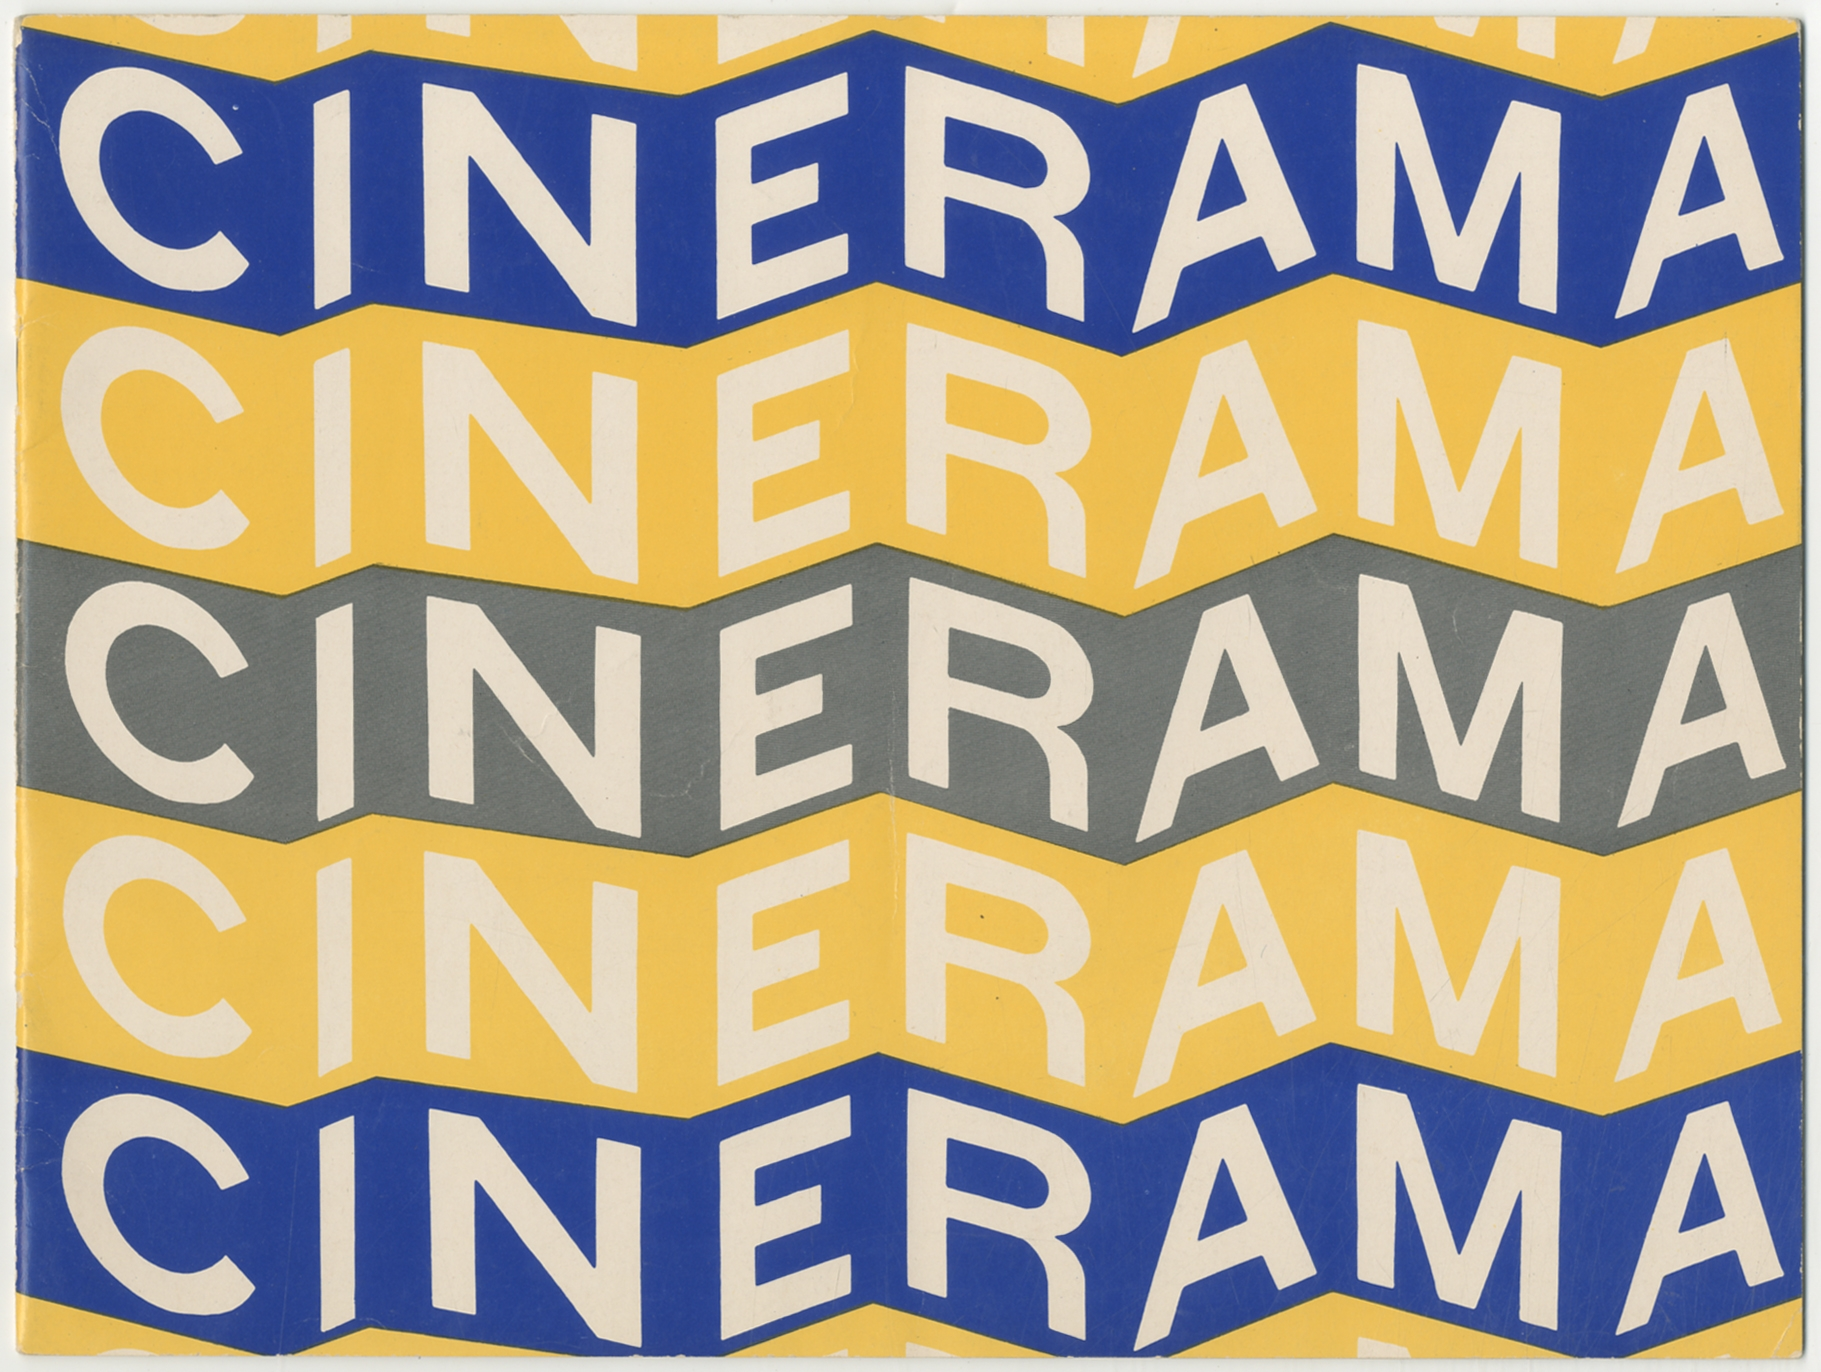 (Program): This is Cinerama Fine